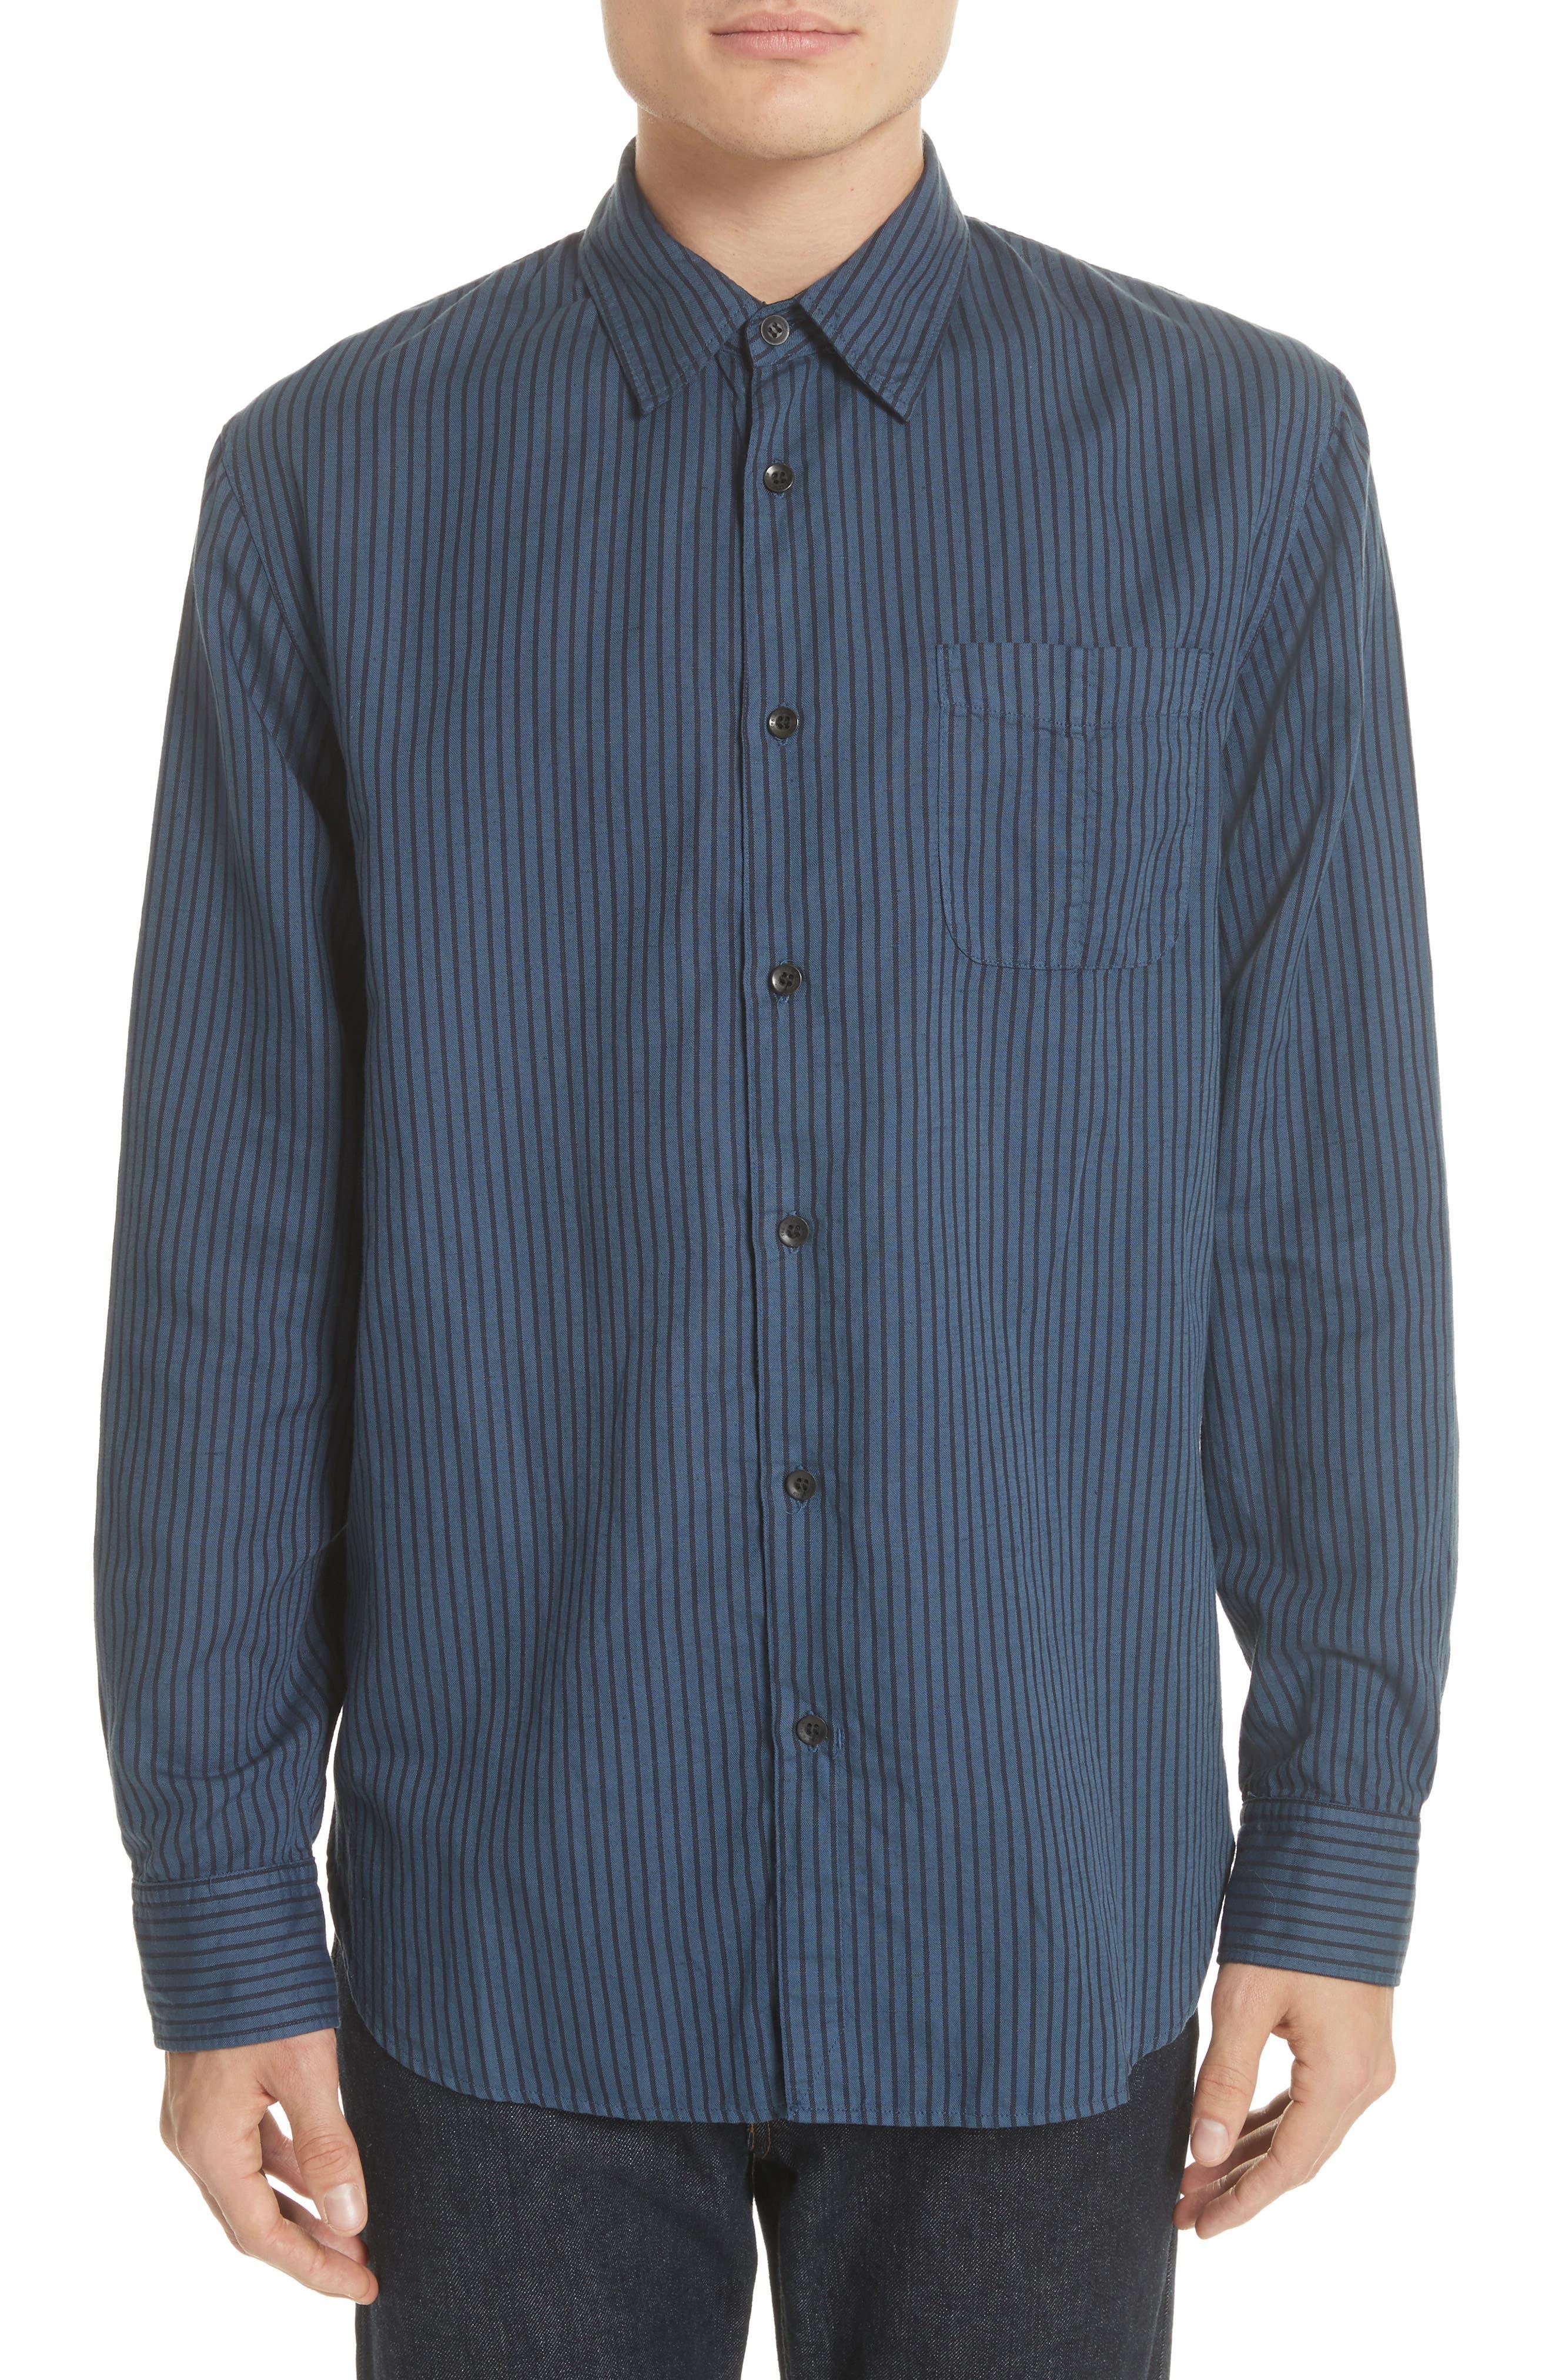 Beach Fit 3 Stripe Shirt,                         Main,                         color,